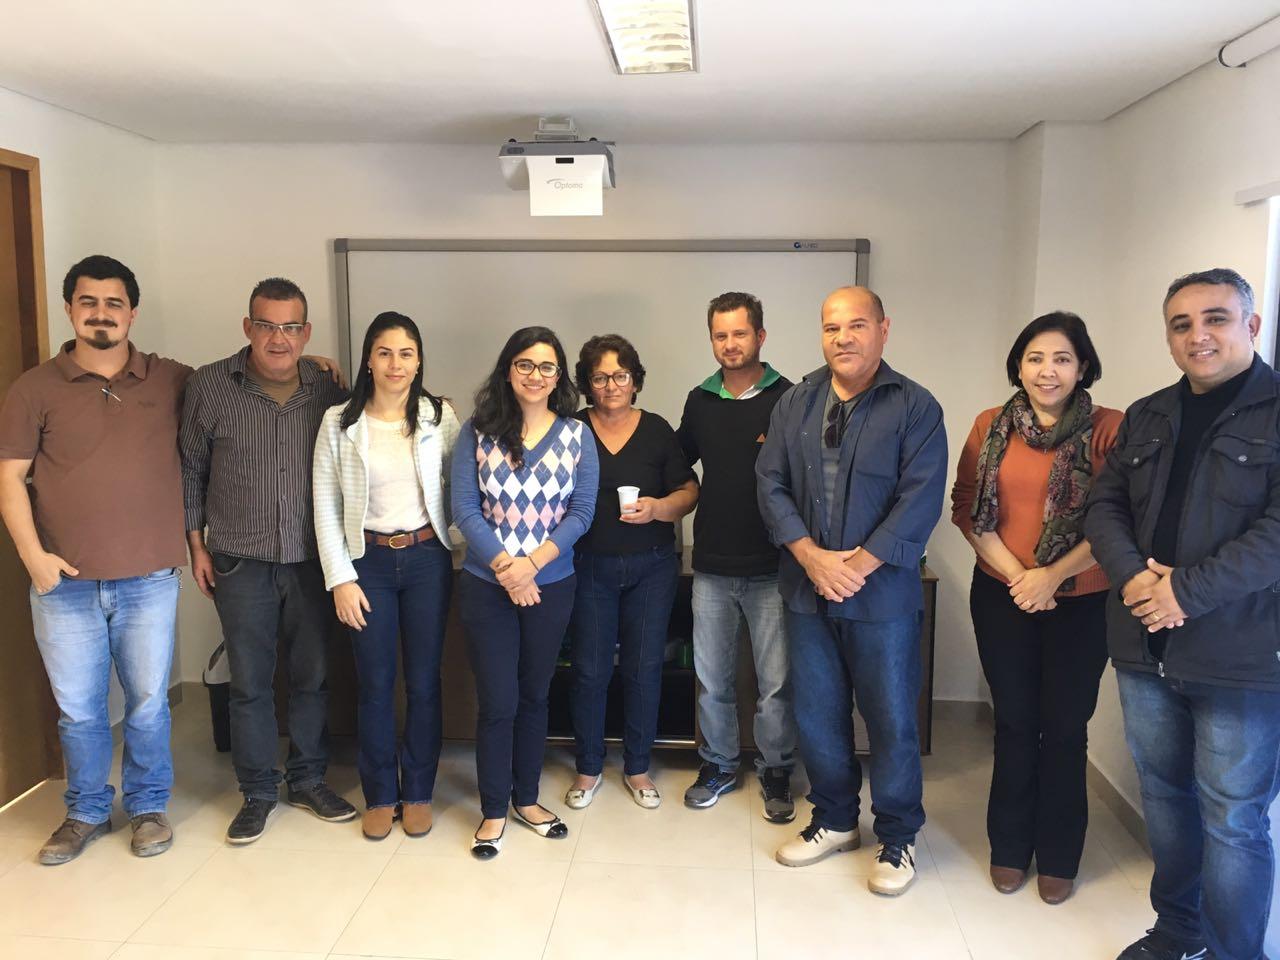 Curso de Indicadores em Miracatu